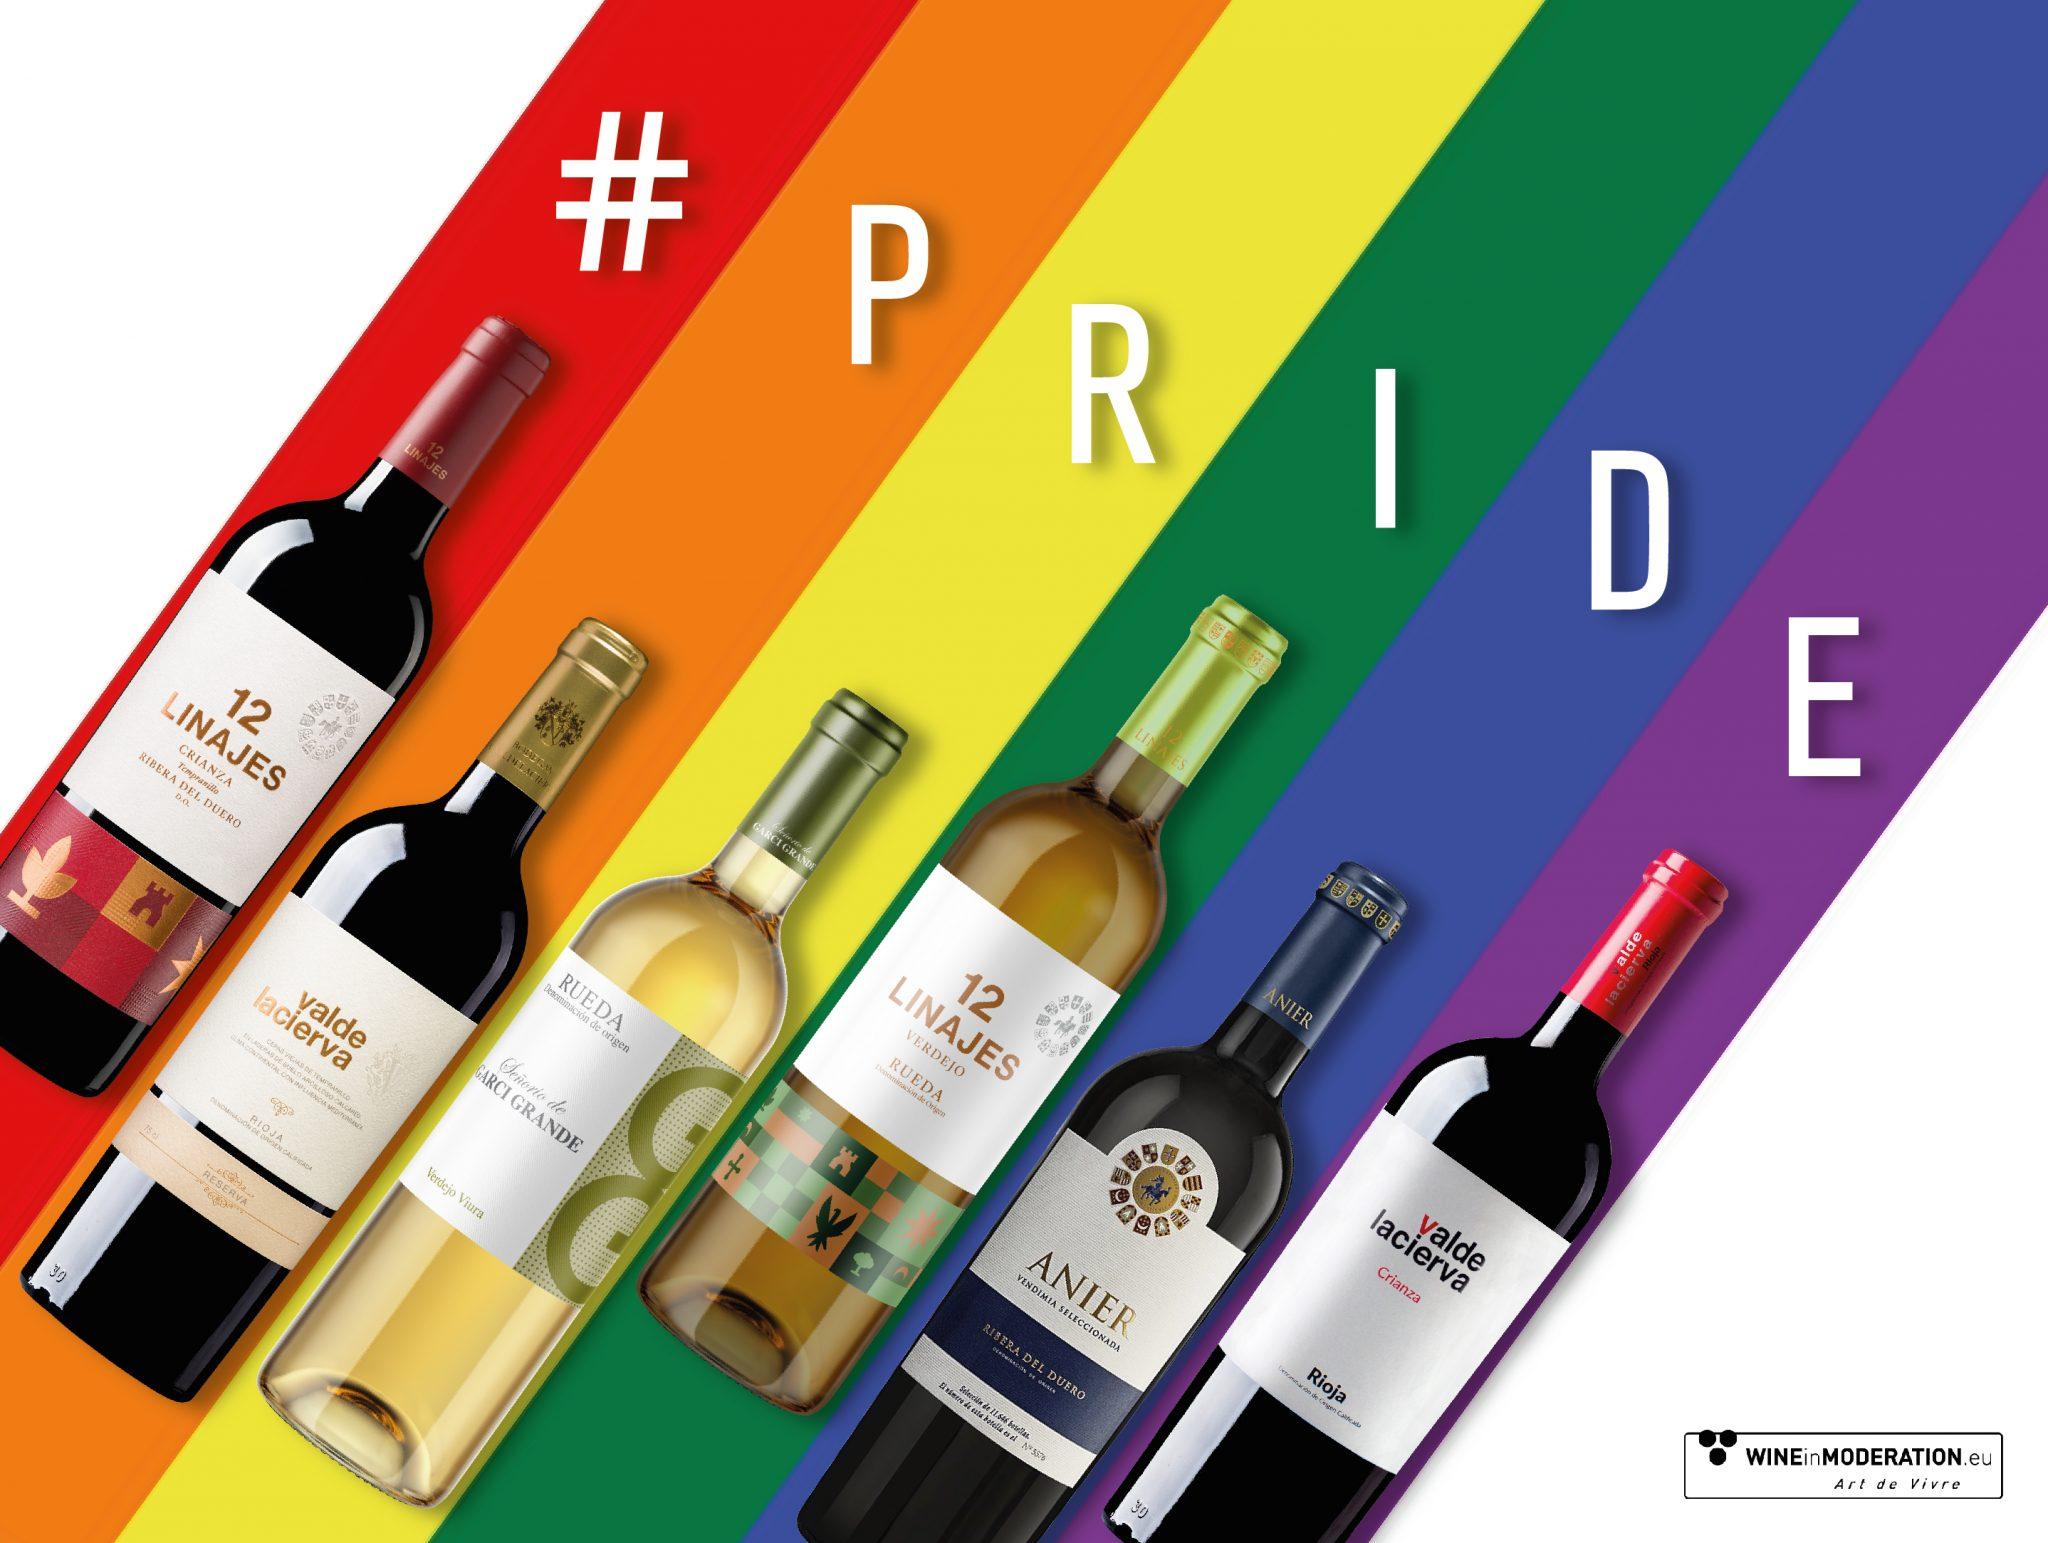 Mado, orgullo & vino